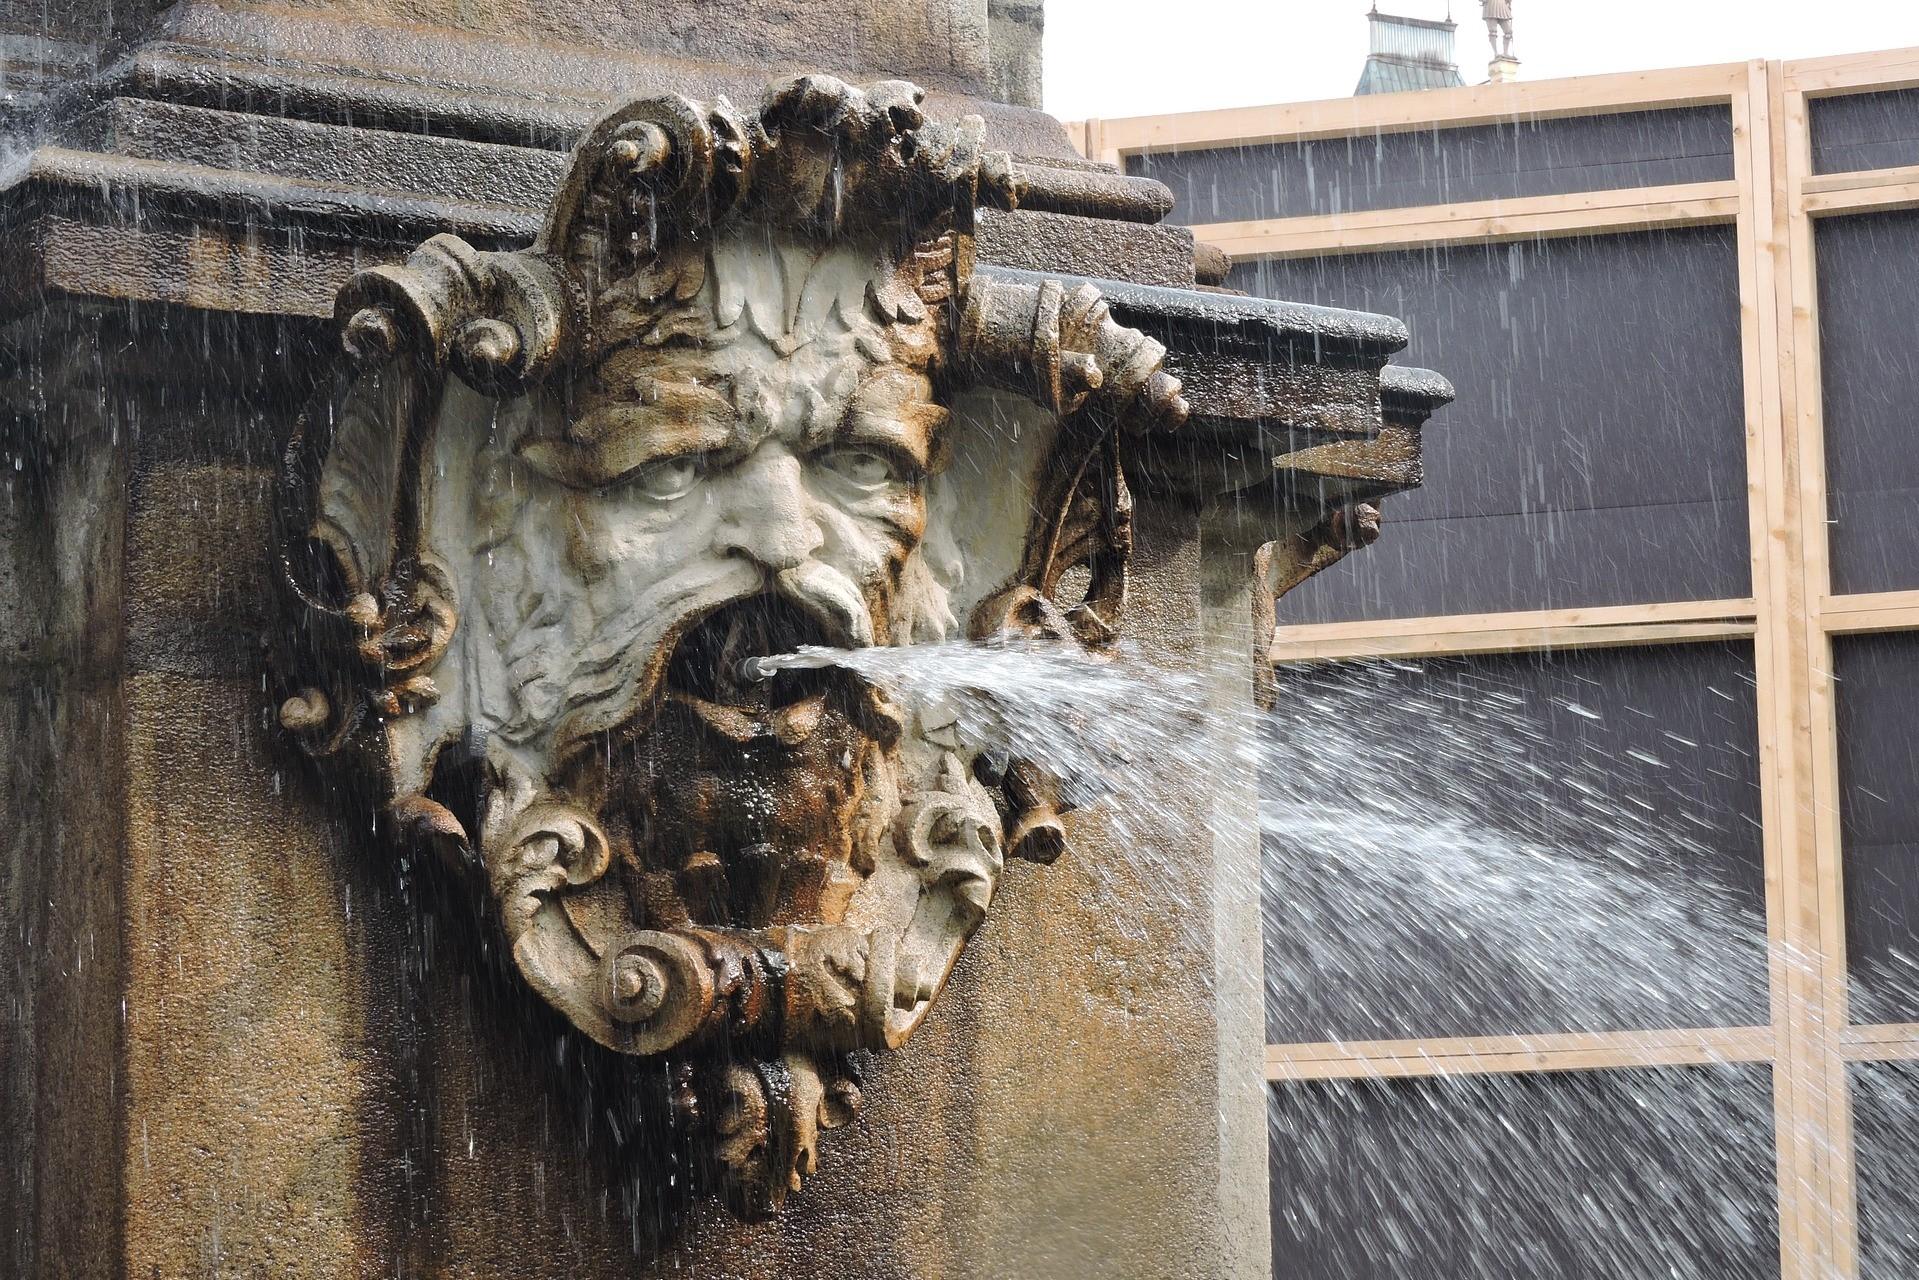 Water fountain spouting water in České Budějovice